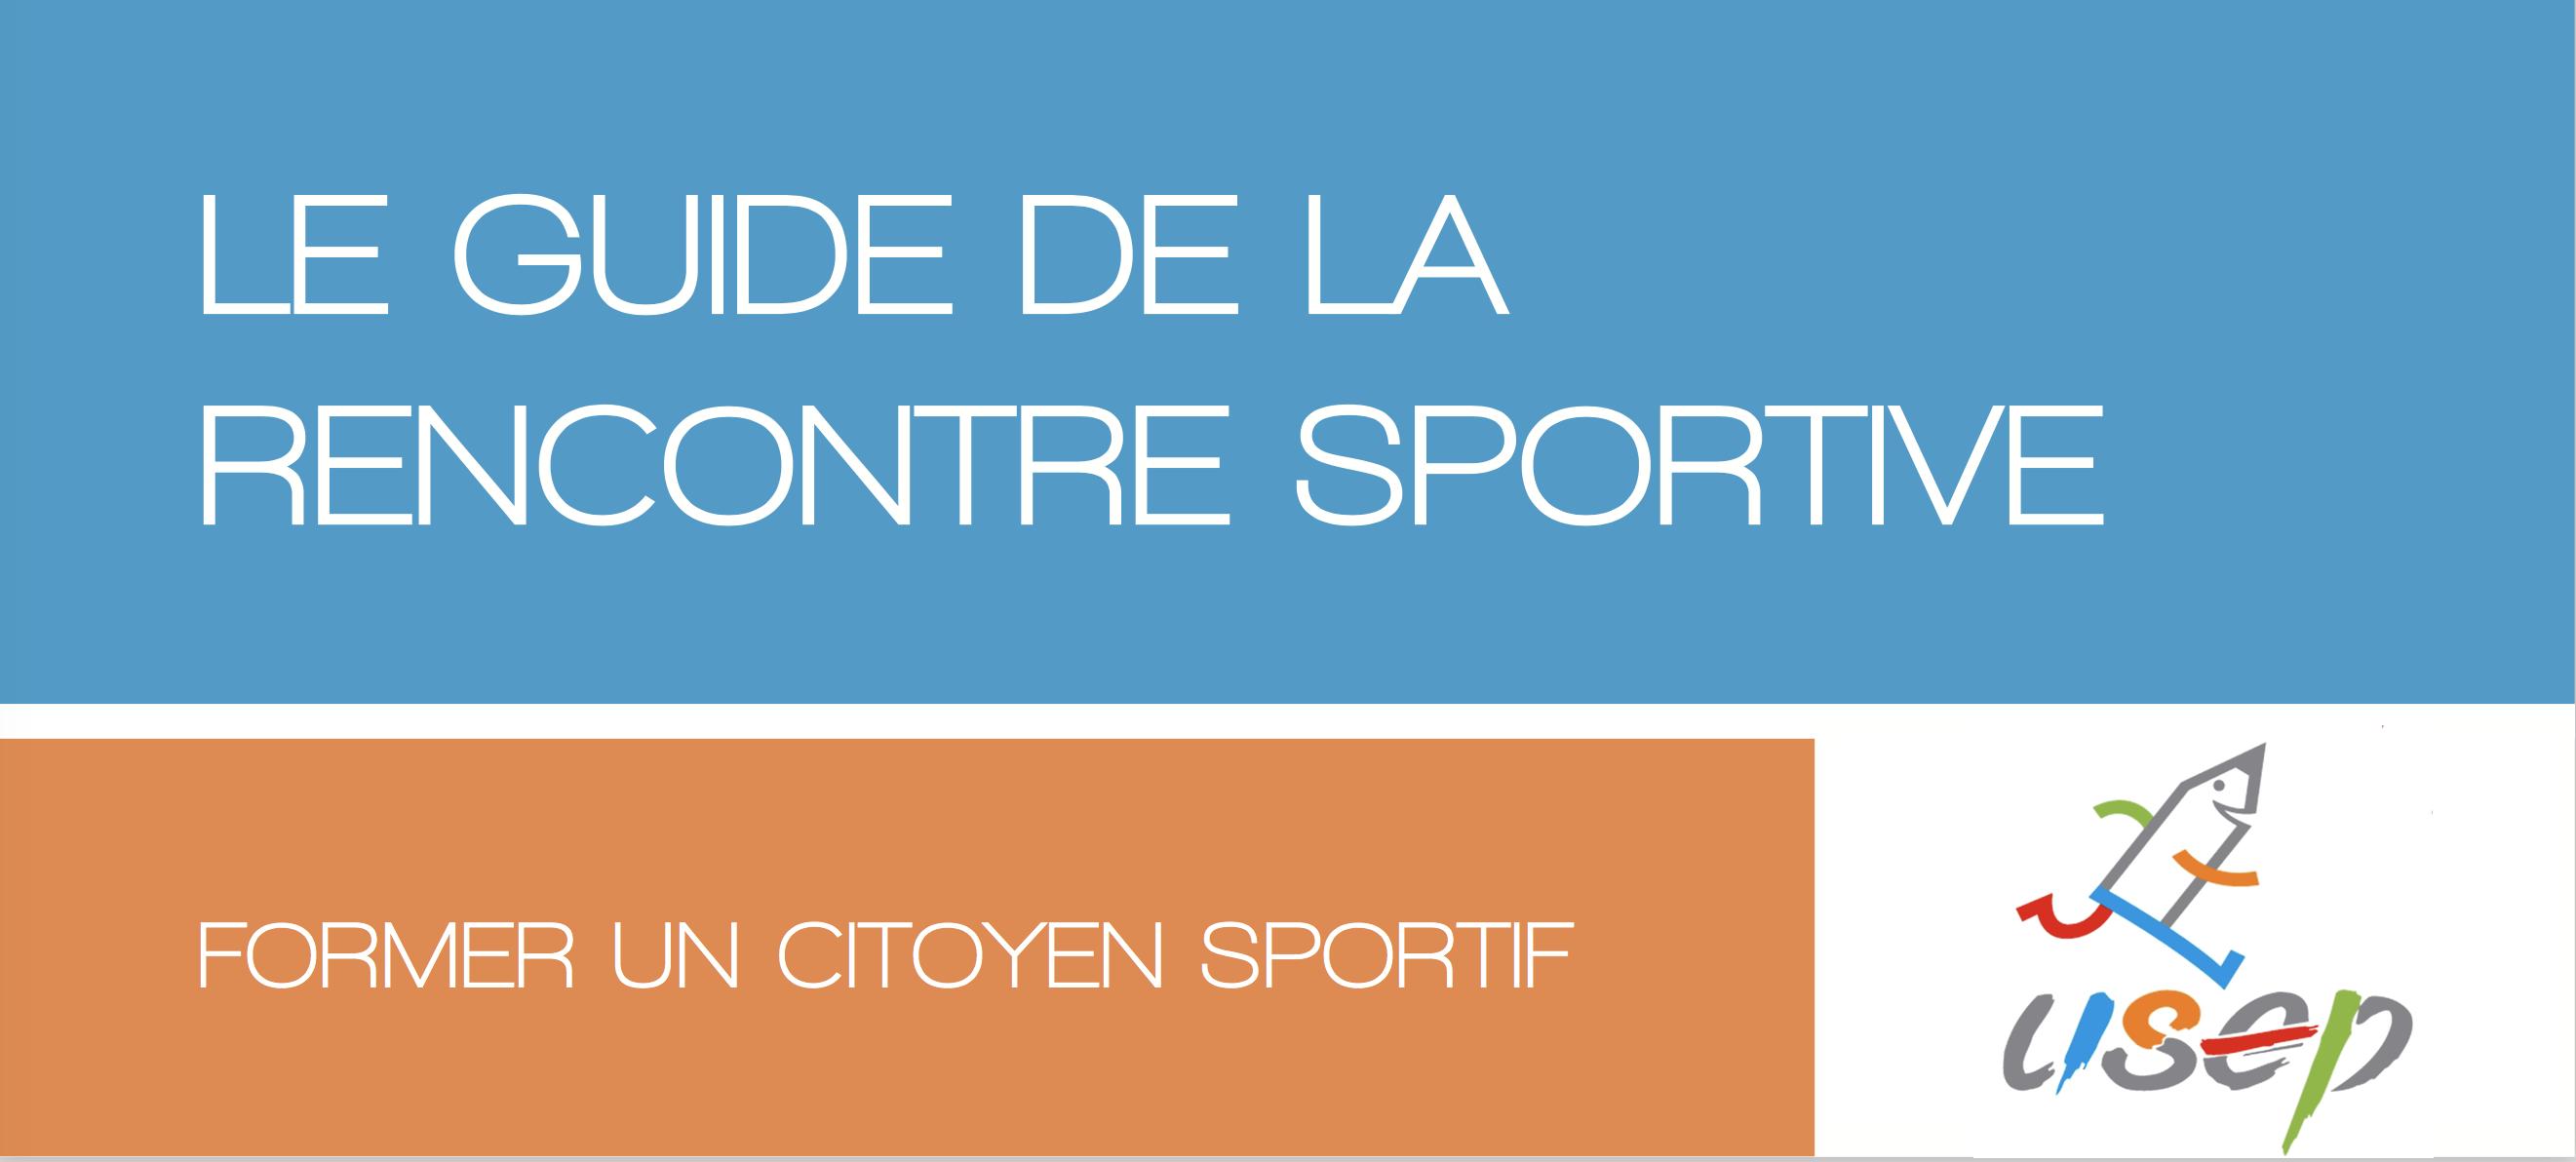 Guide de la rencontre sportive